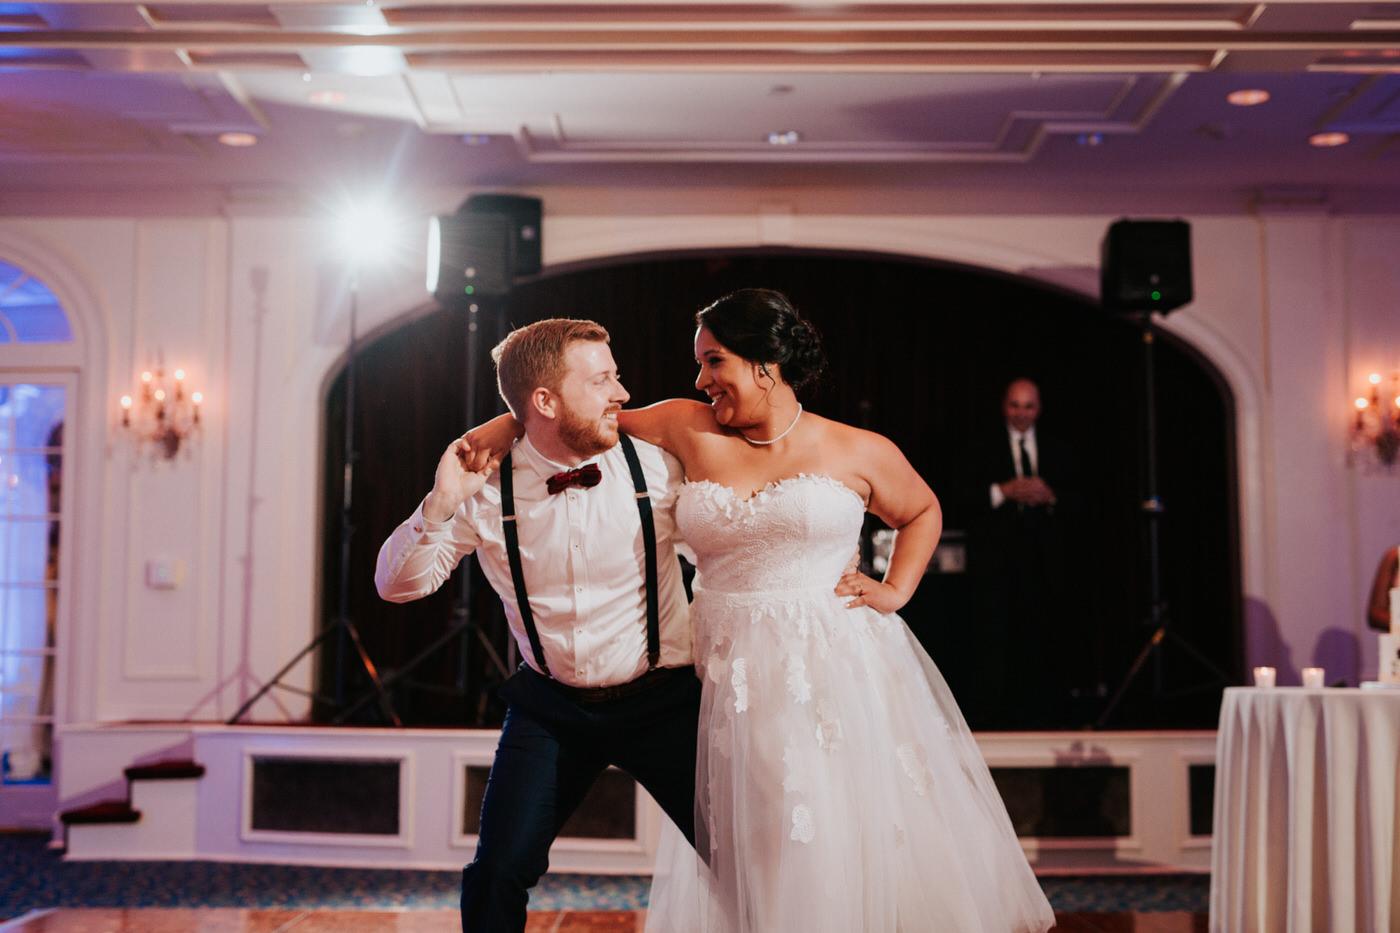 Wentworth New Hampshire Wedding - Diana Ascarrunz Photography-995.jpg